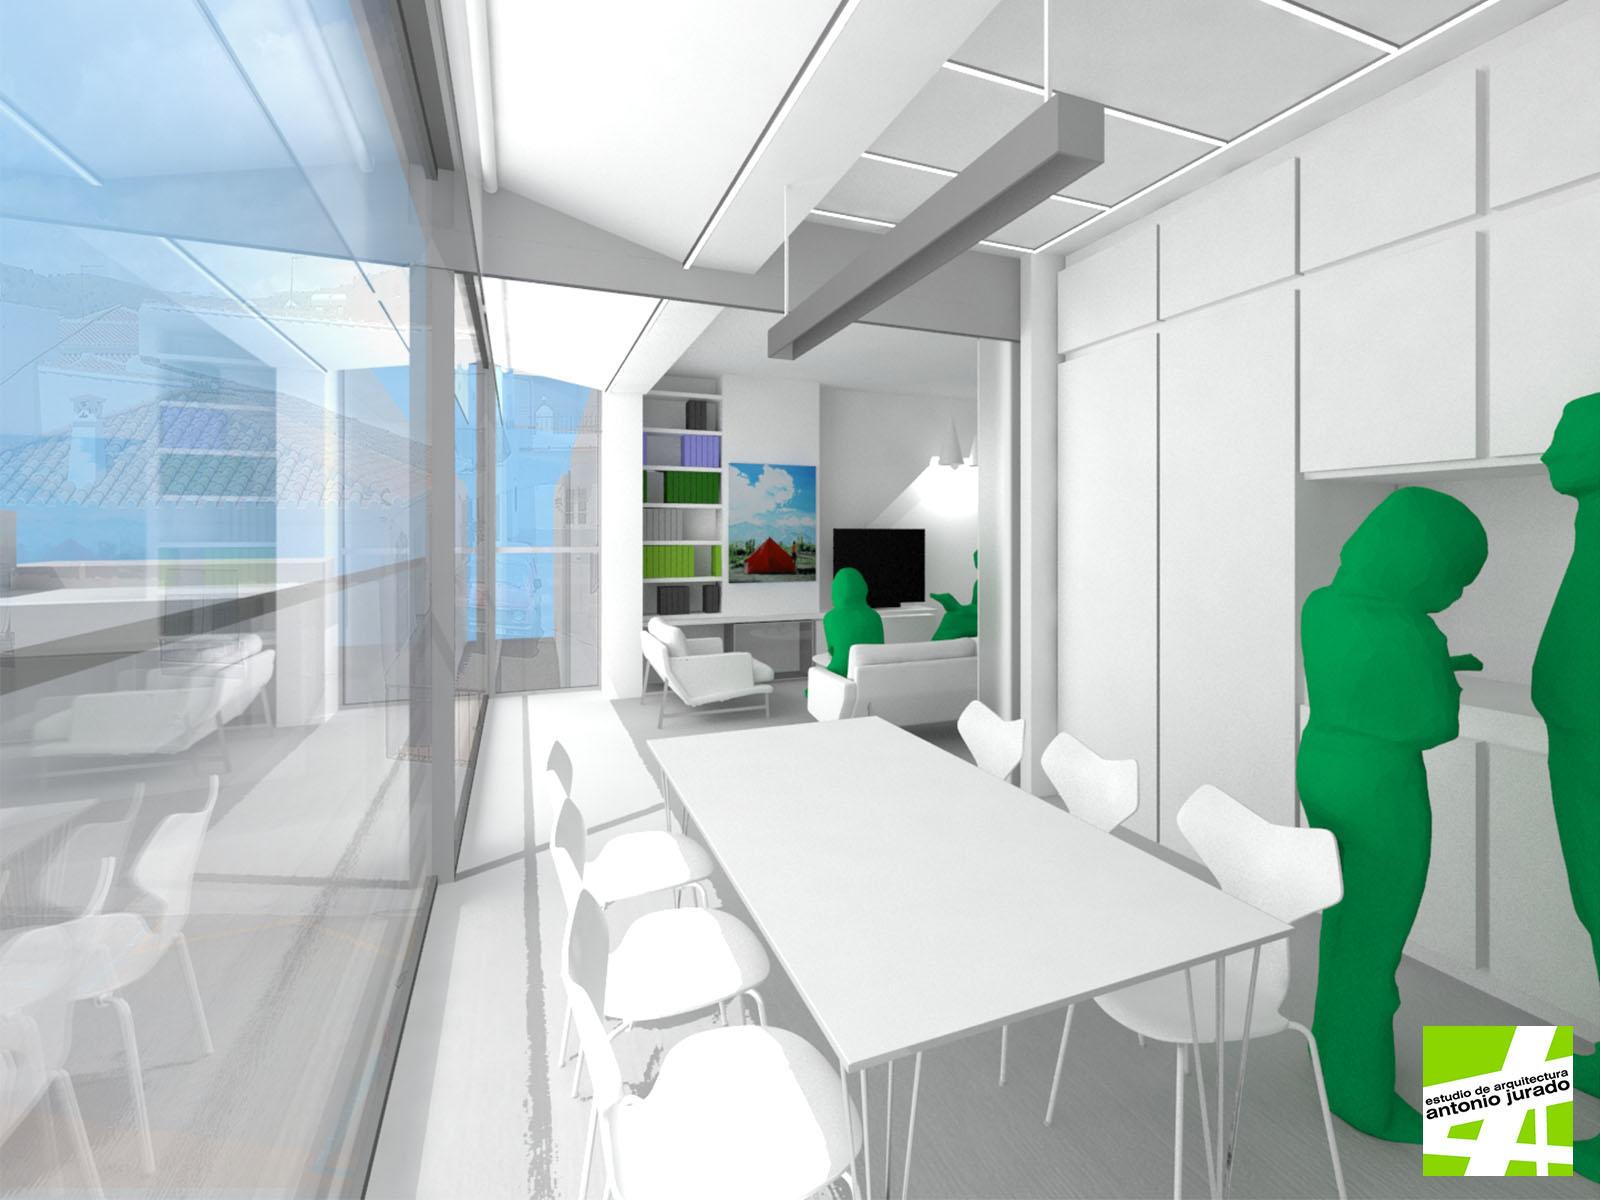 casa-ra-house-torrox-malaga-antonio-jurado-arquitecto-05